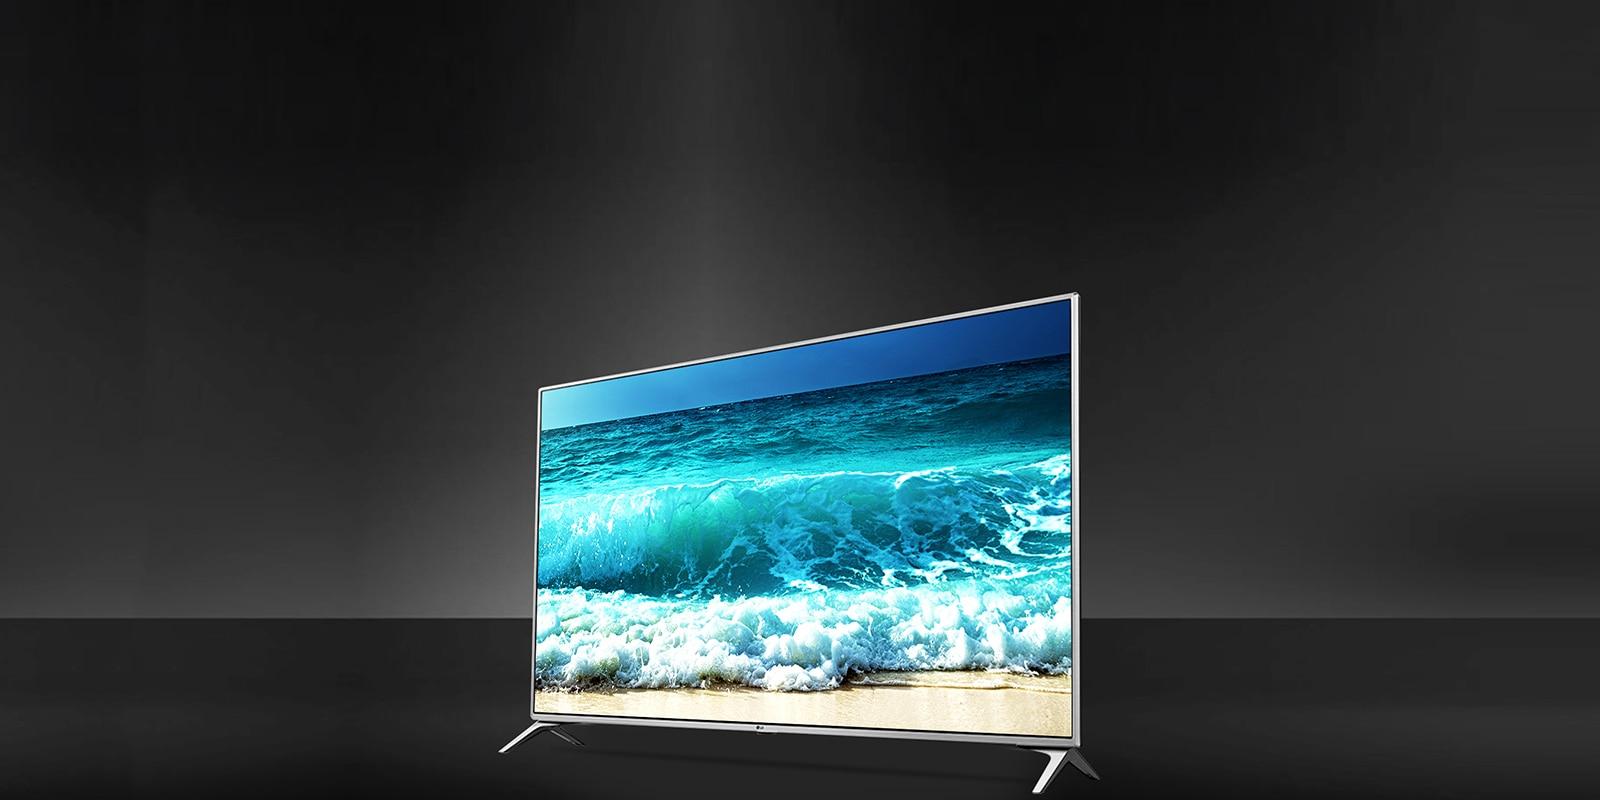 lg ultra hd tvs: browse lg's range of 4k tvs | lg philippines